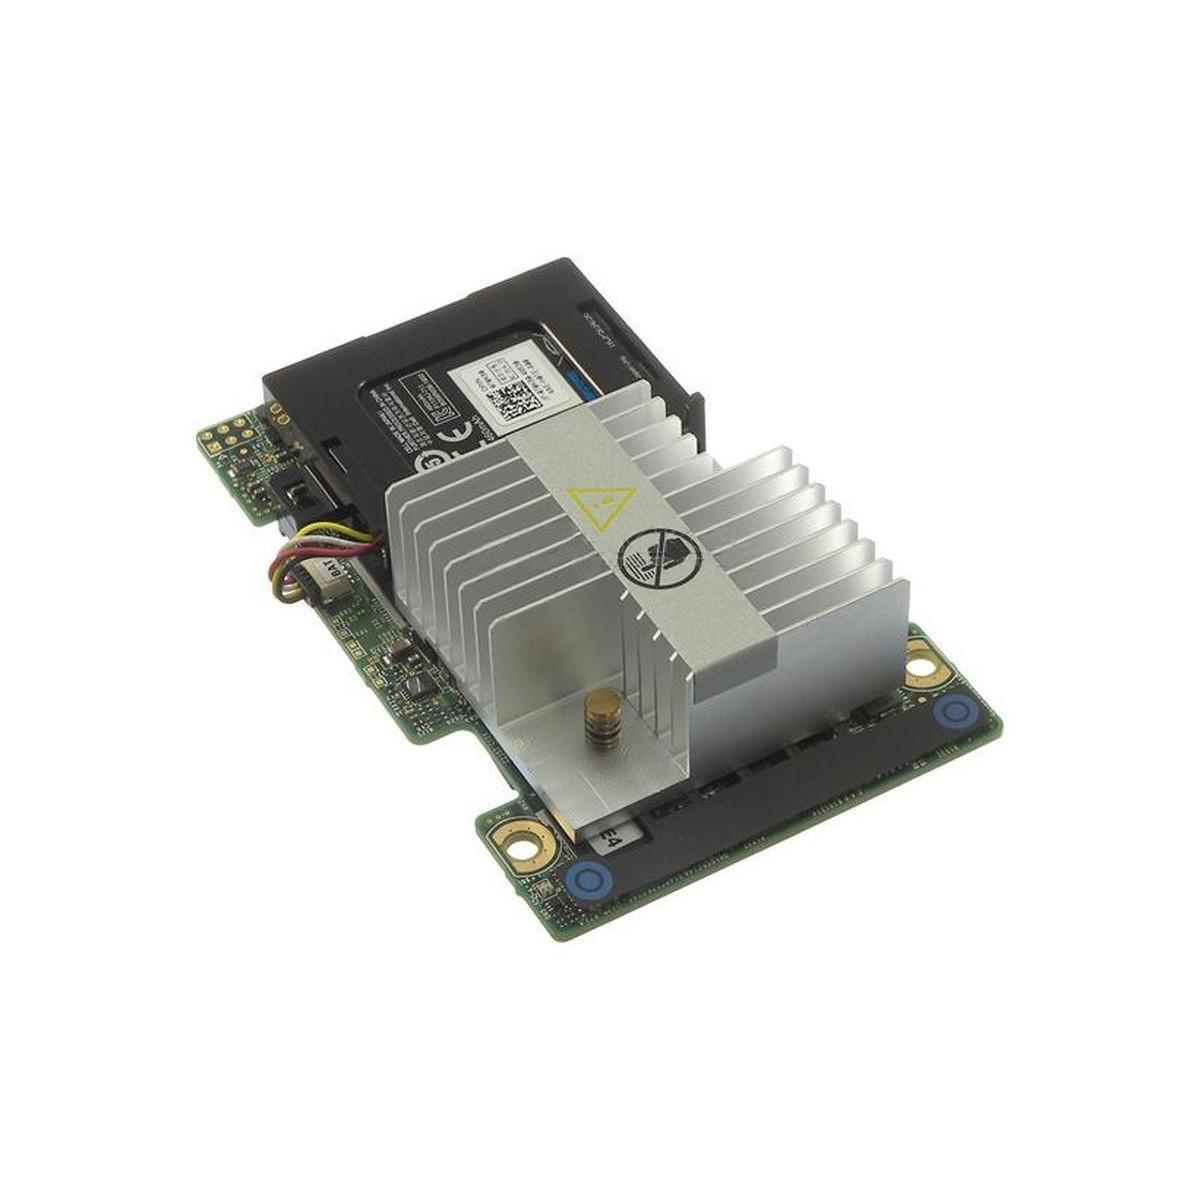 LENOVO S30 E5-2620 SIX 16GB 250SSD 1TB Q2000 WIN7